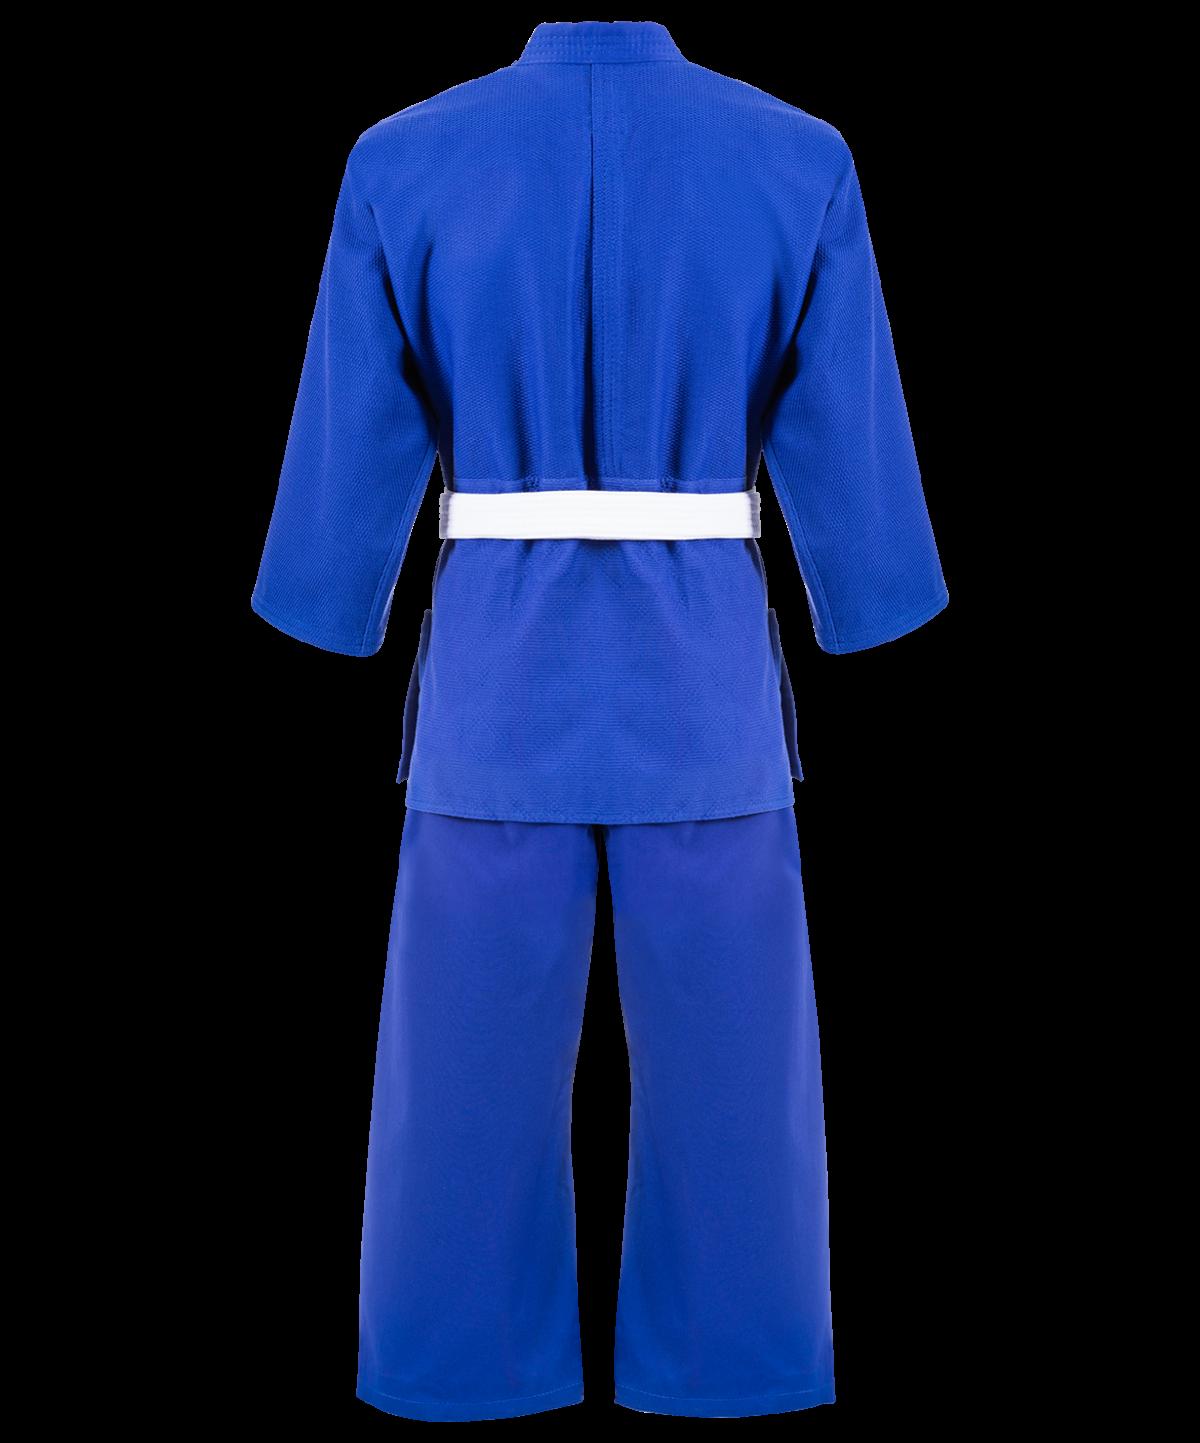 GREEN HILL Кимоно дзюдо 4/170  MA-301: синий - 2